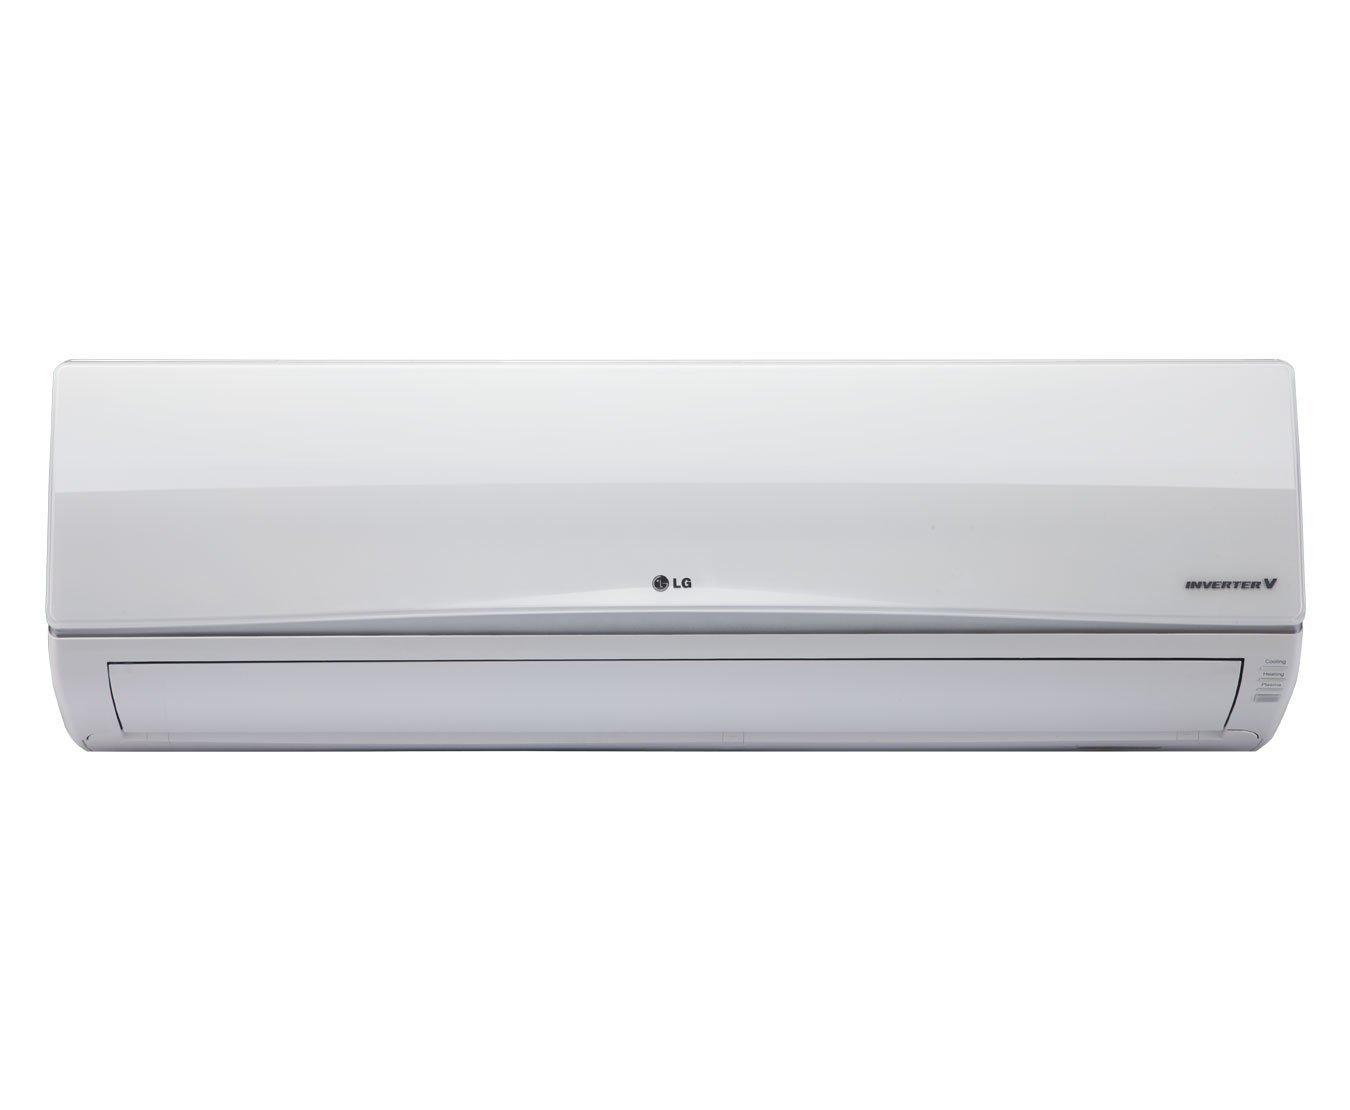 Godrej Inverter Air Conditioner Photos